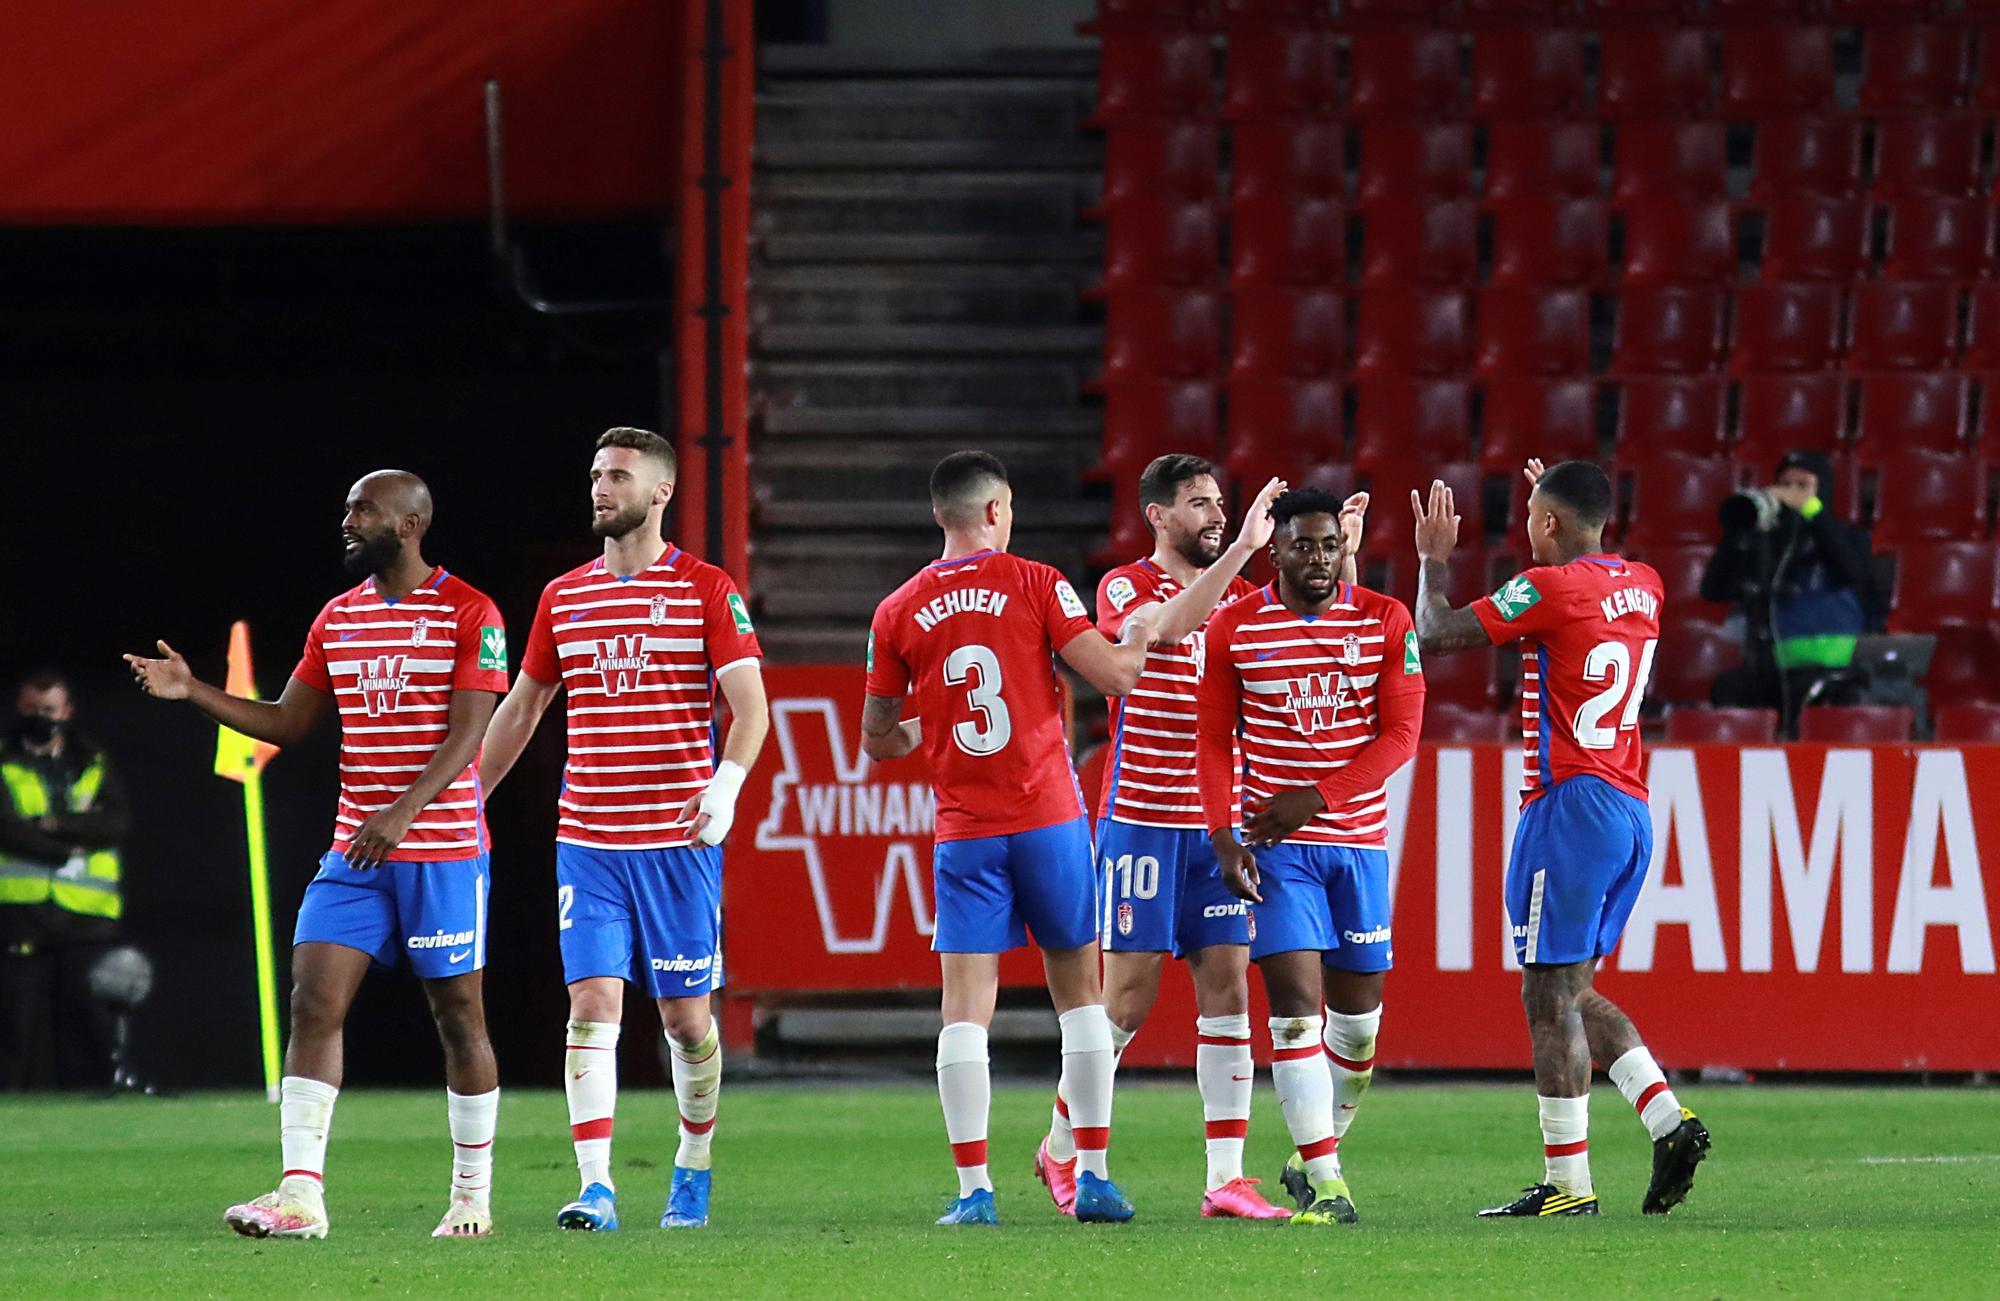 Granada - Elche: El Elche deja pasar el tren (2-1)